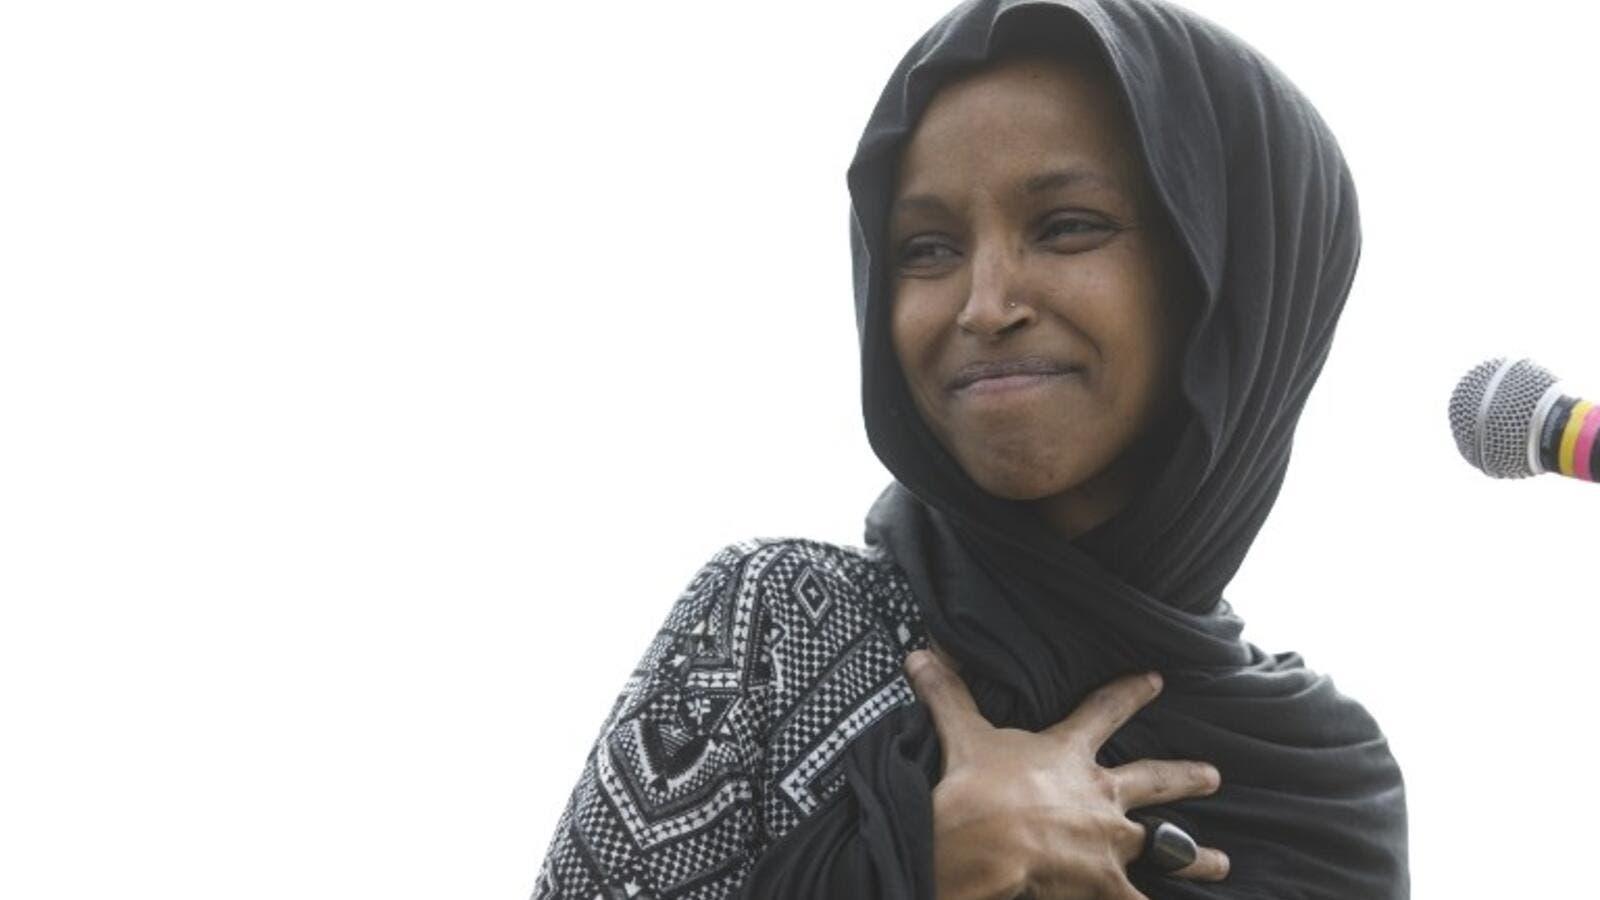 ilhan omar accused of cheering jewish lobby aipac